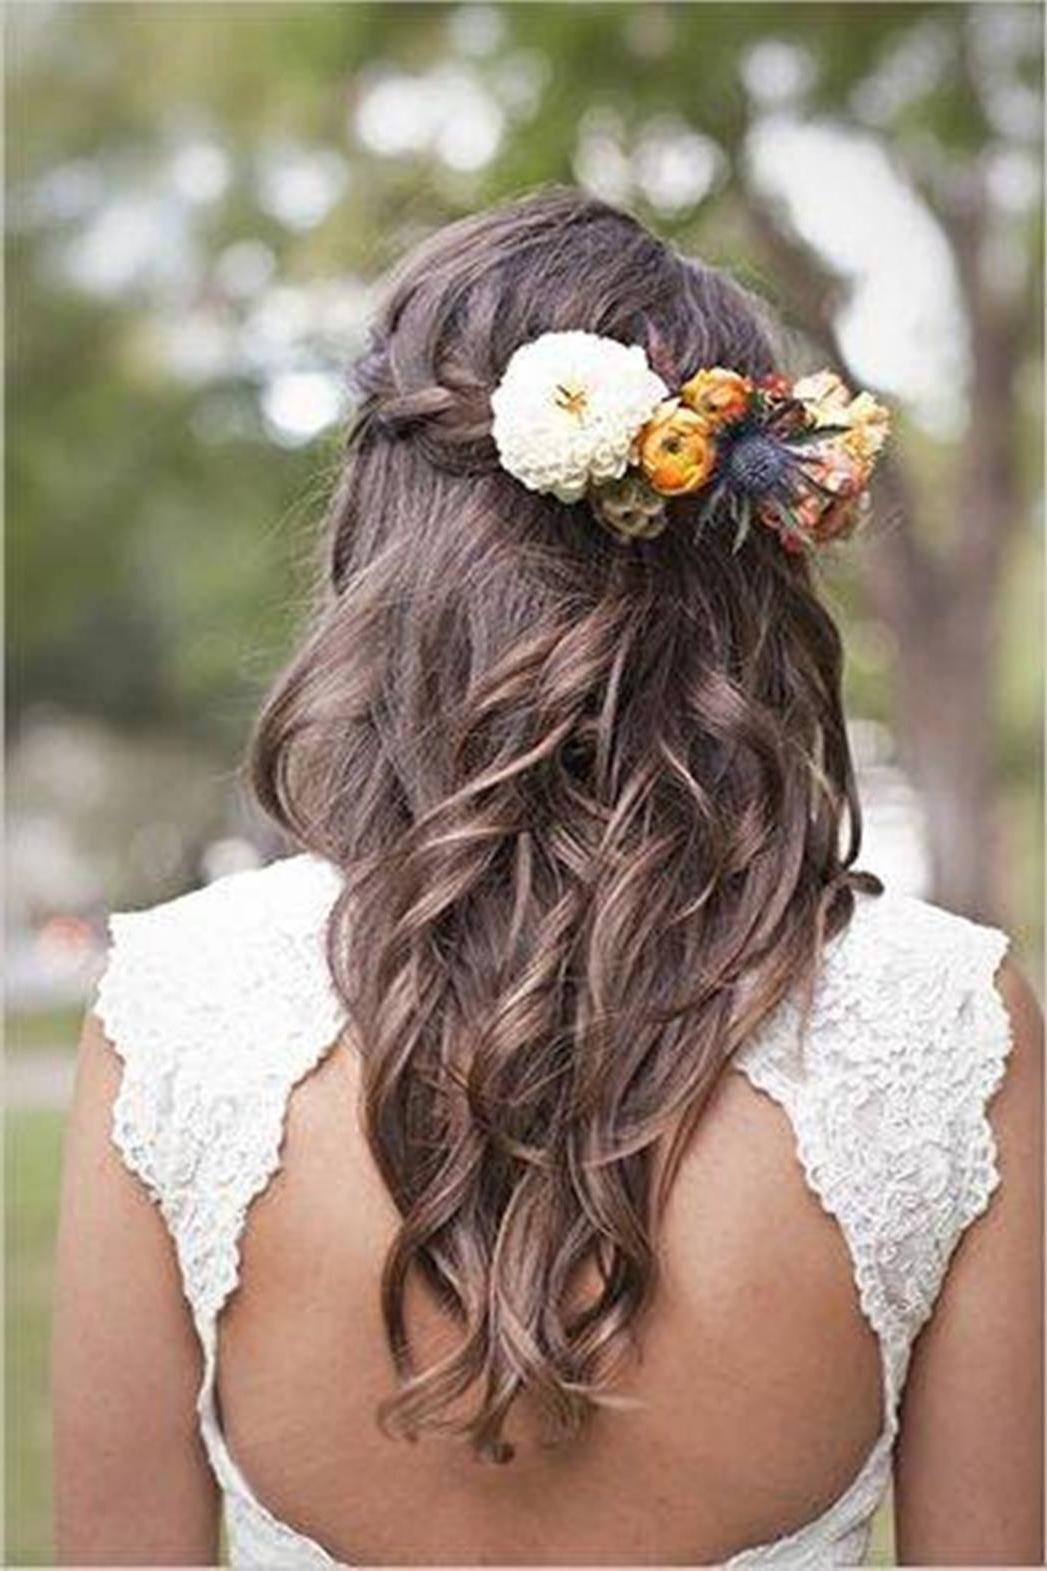 Most Popular Braided Wedding Hairstyles Pertaining To Braid Hairstyles For Wedding Black Styles Side Bridal Box Weddings (View 12 of 15)